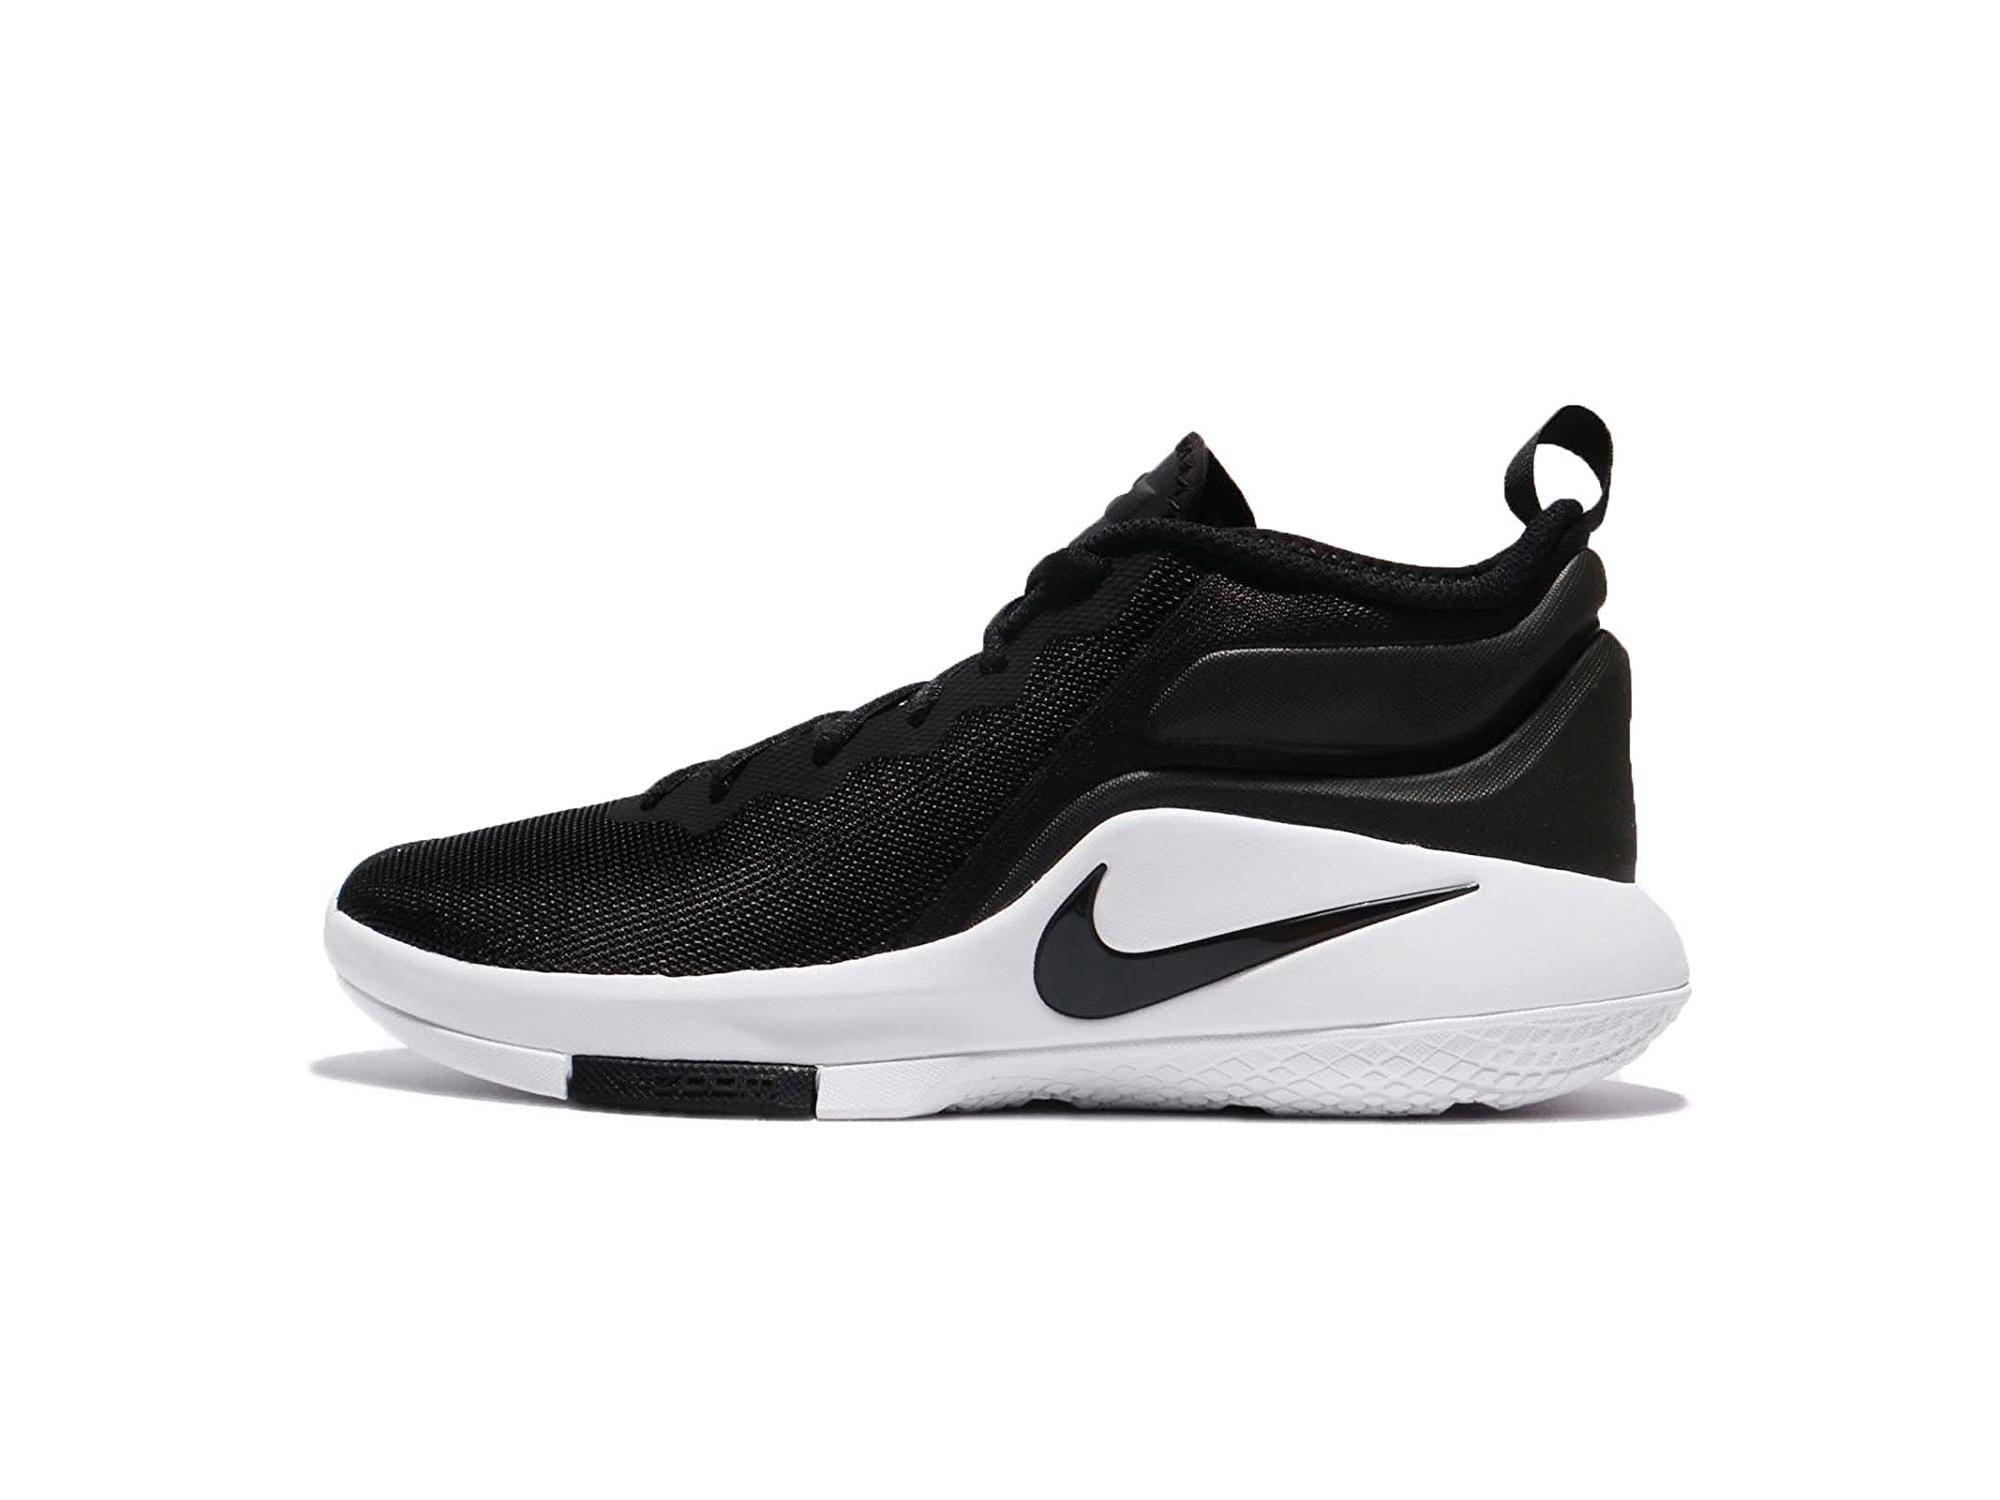 promo code 78210 58943 Nike Mens Lebron Witness II Low Top